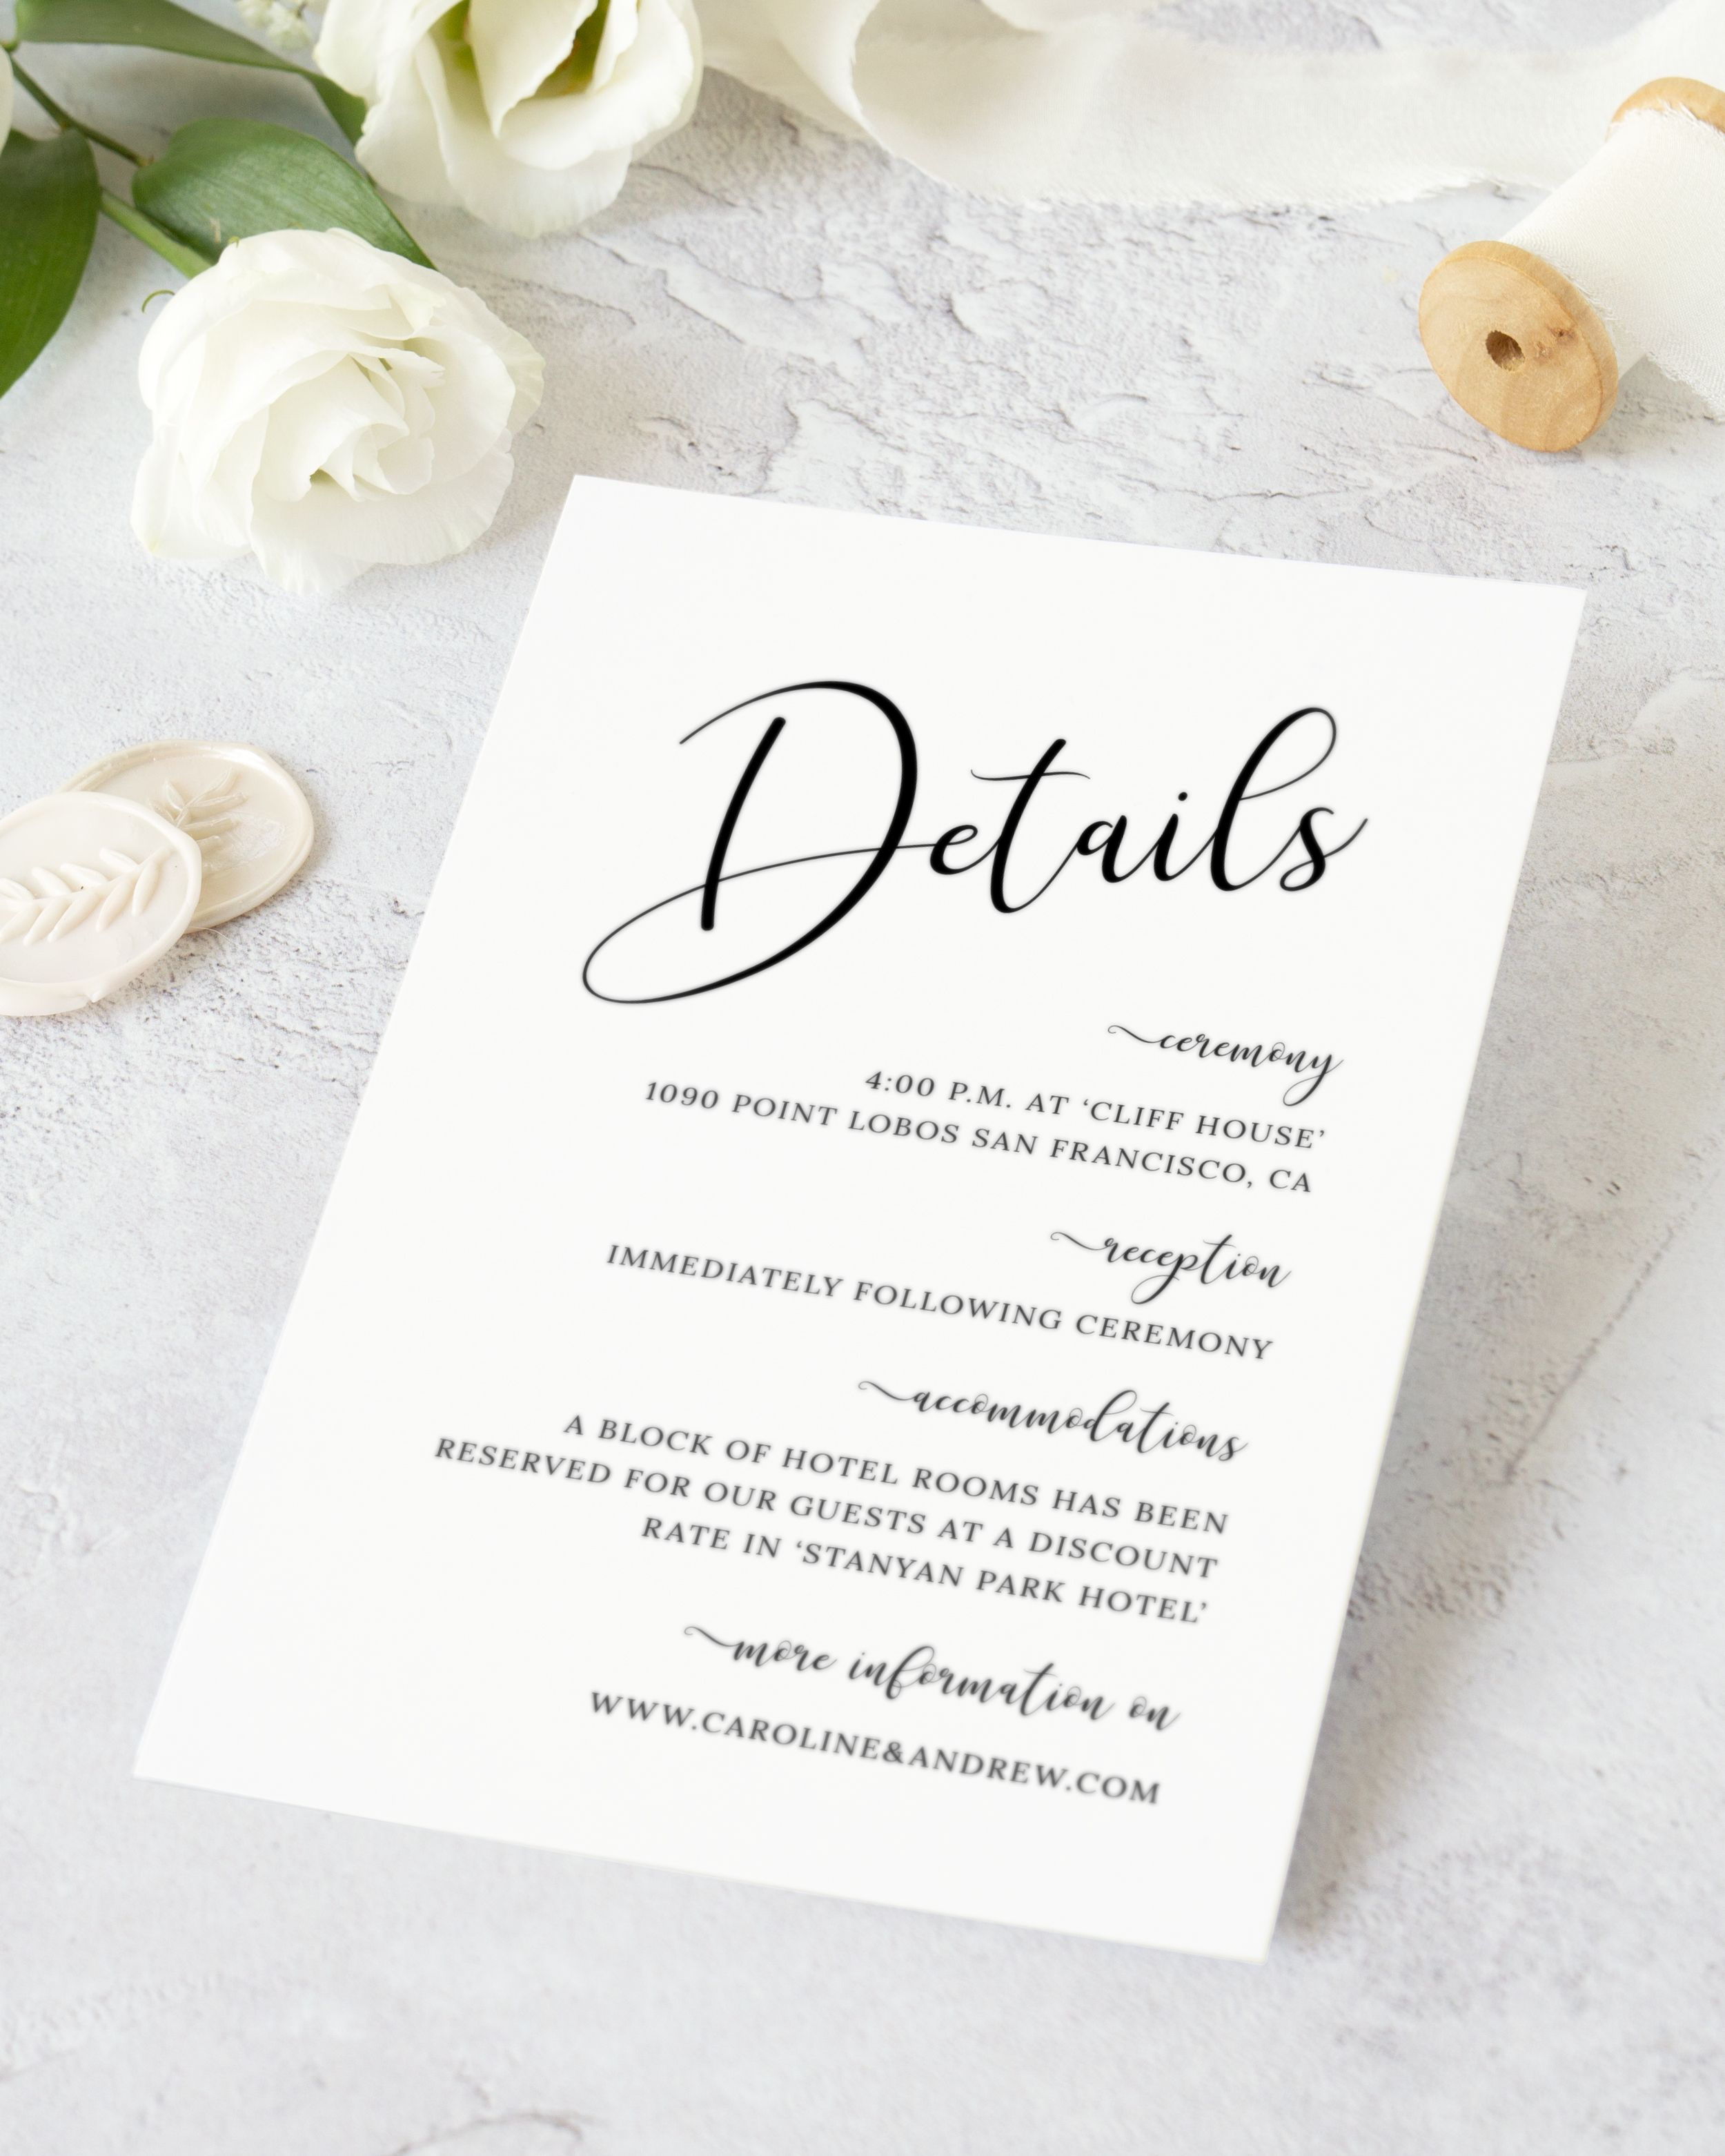 Calligraphy Wedding Details Card Template Modern Black And White Wedding Invitation Insert Diy Simple Elegant Wedding Details Card Cl19 Wedding Invitation Inserts Wedding Details Card Printable Wedding Invitations